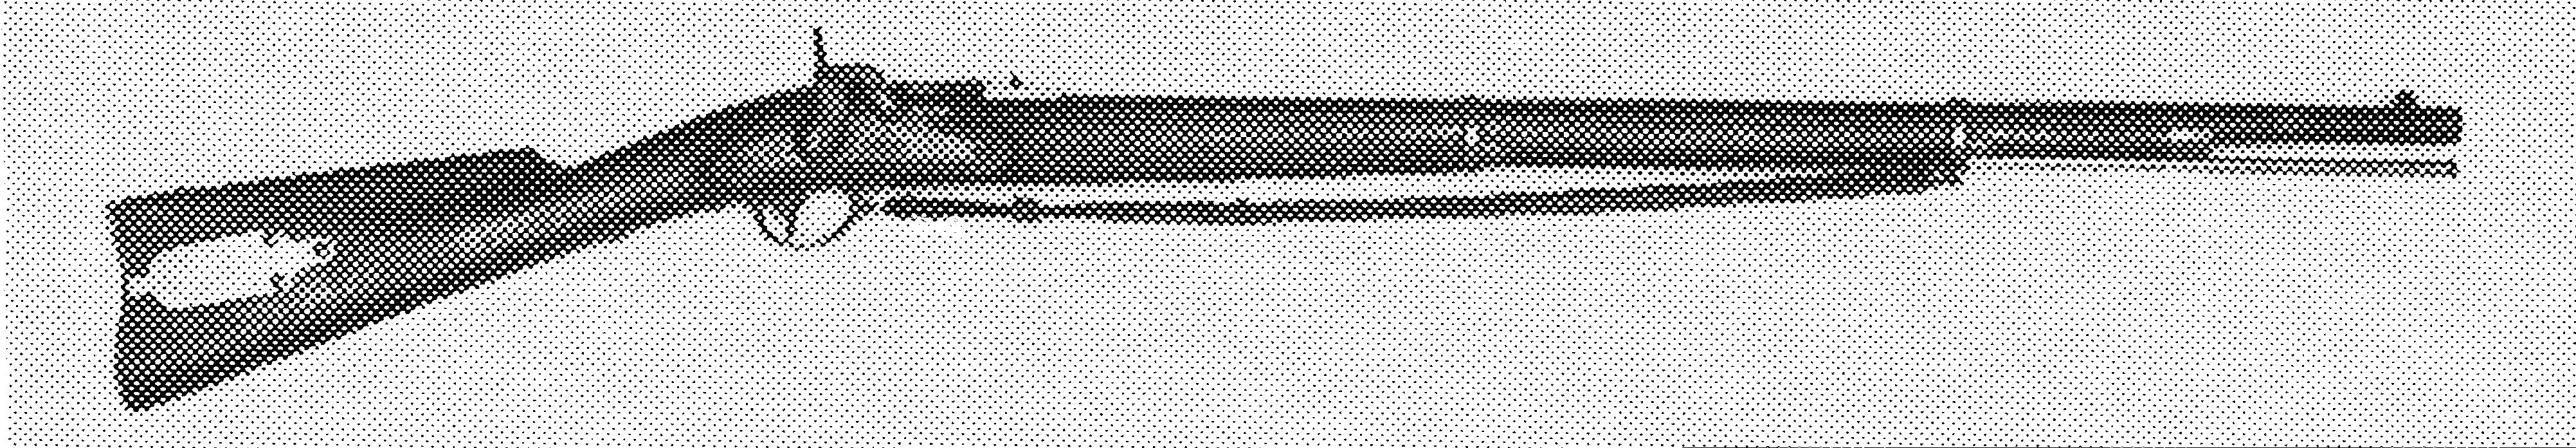 Merrill Rifle